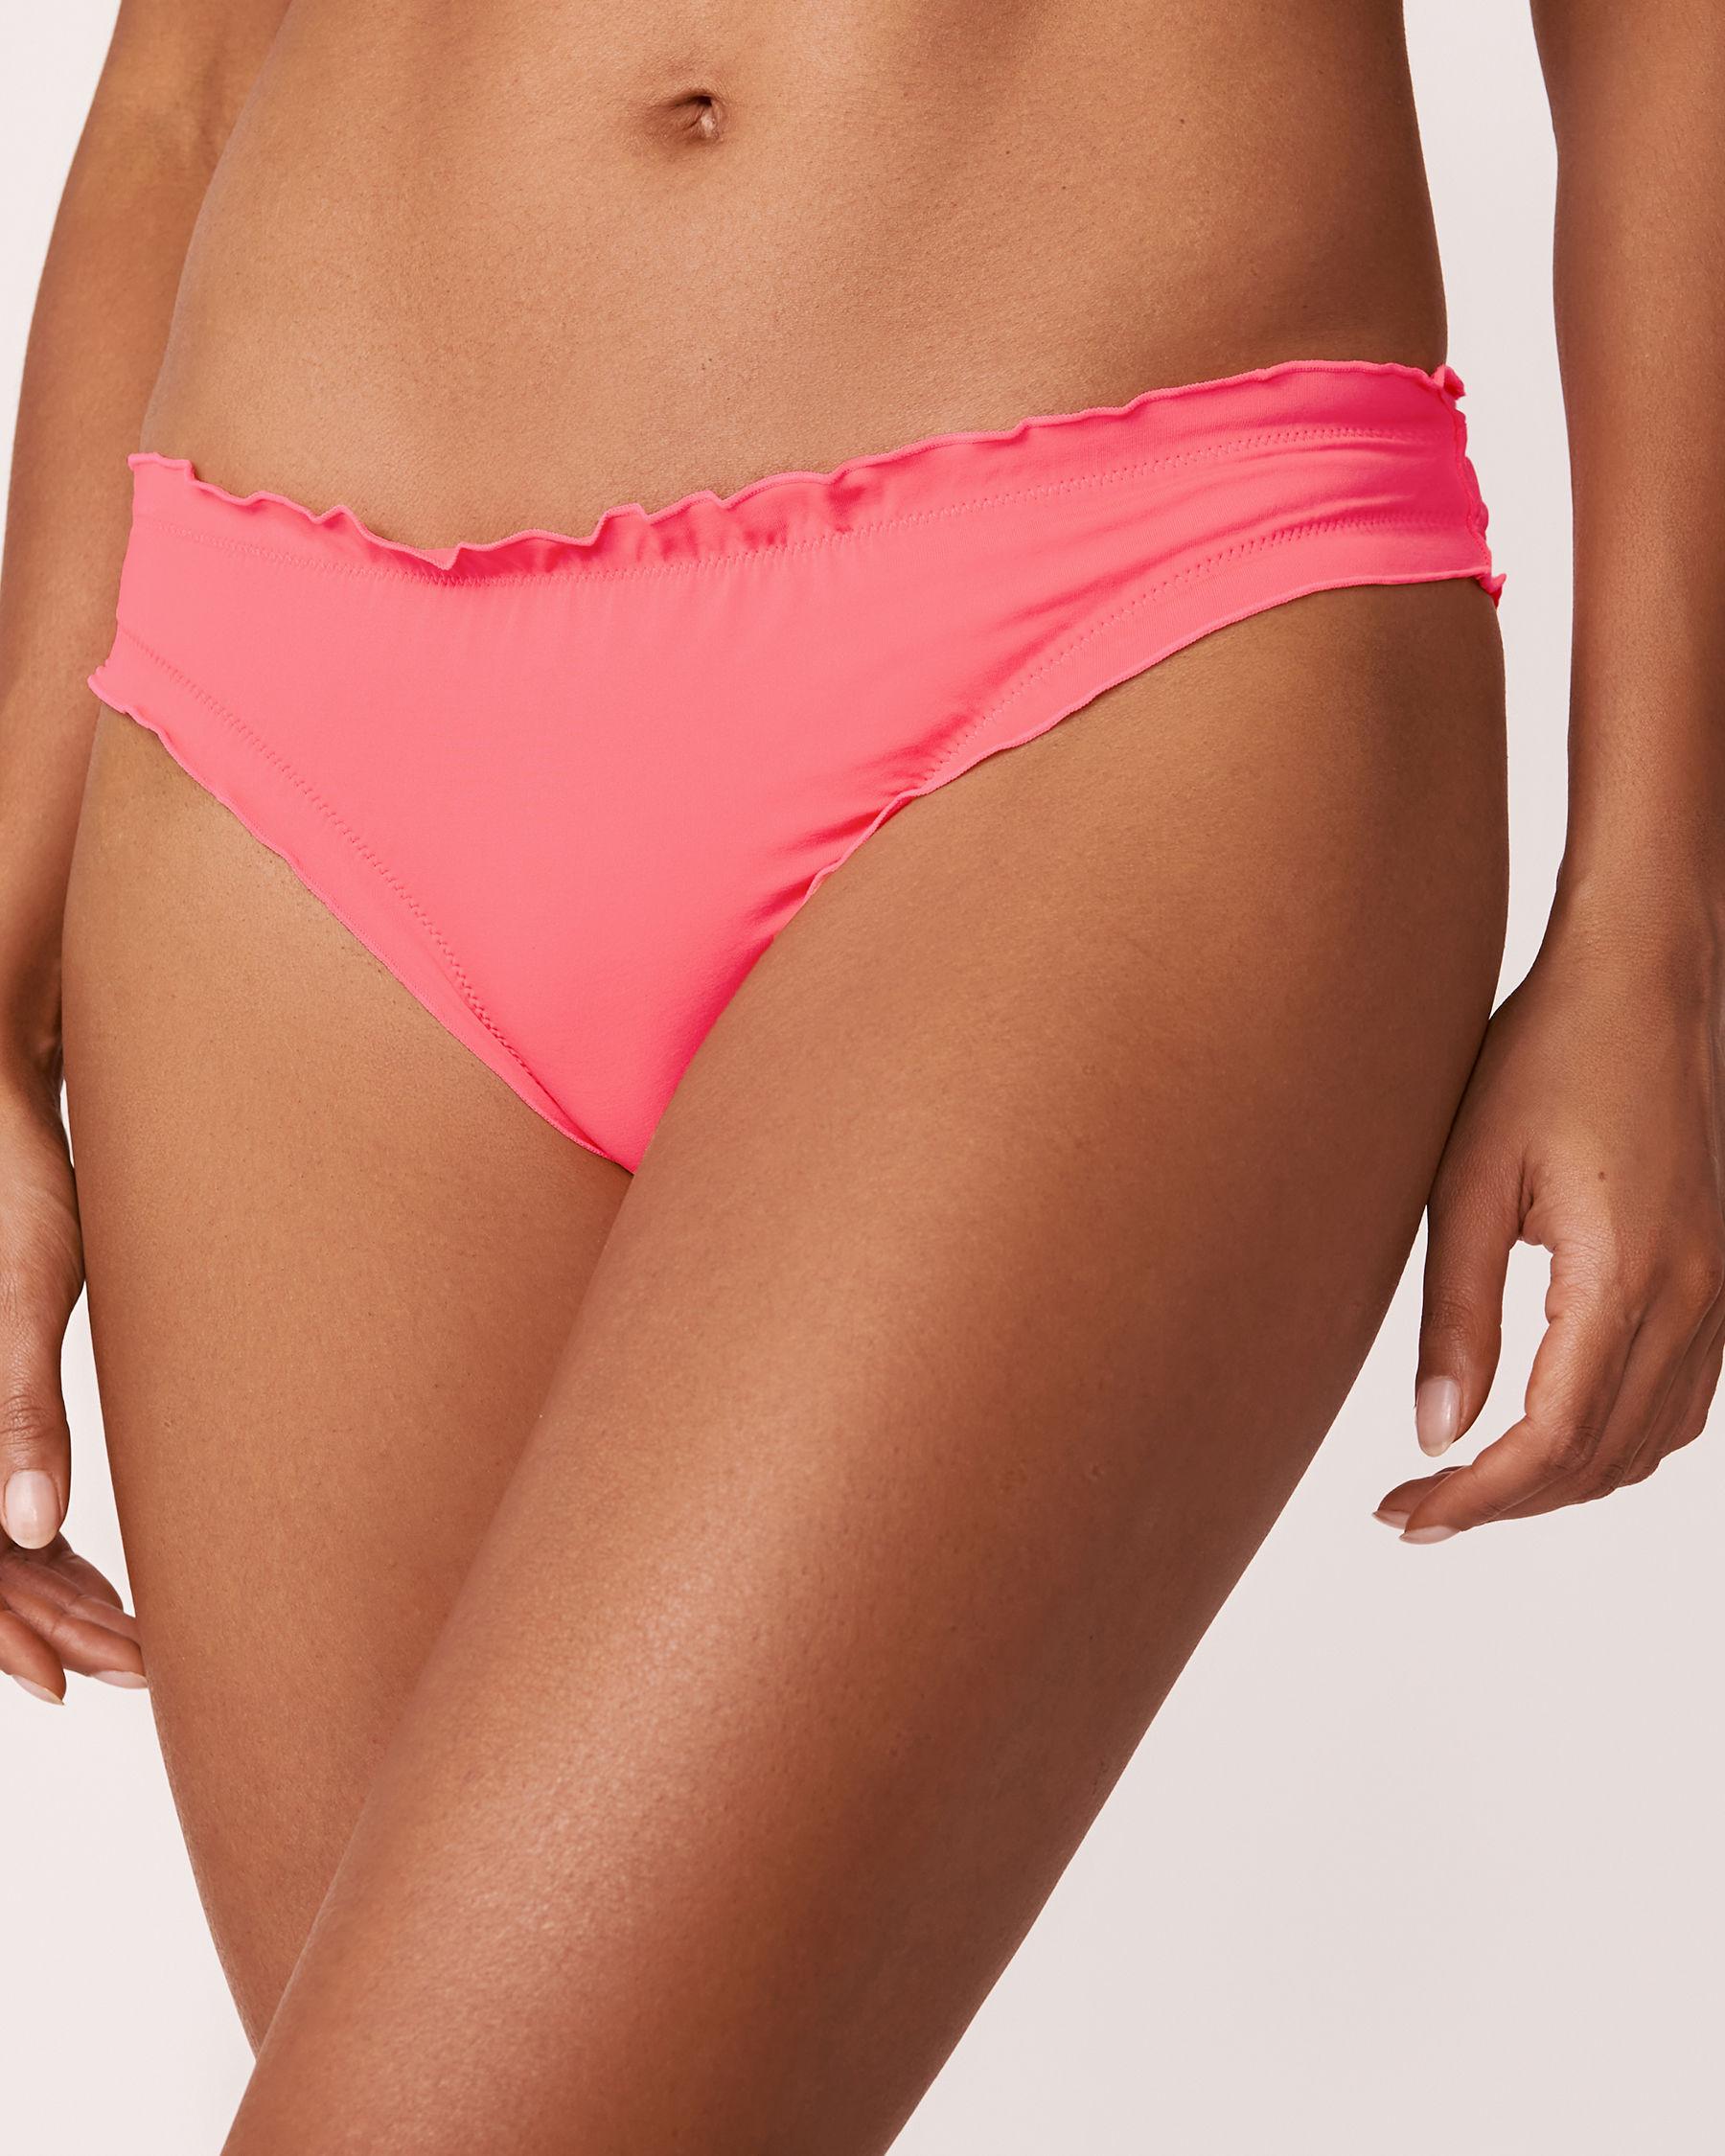 LA VIE EN ROSE AQUA MELON Ruffle Bikini Bottom Pink 70300035 - View3